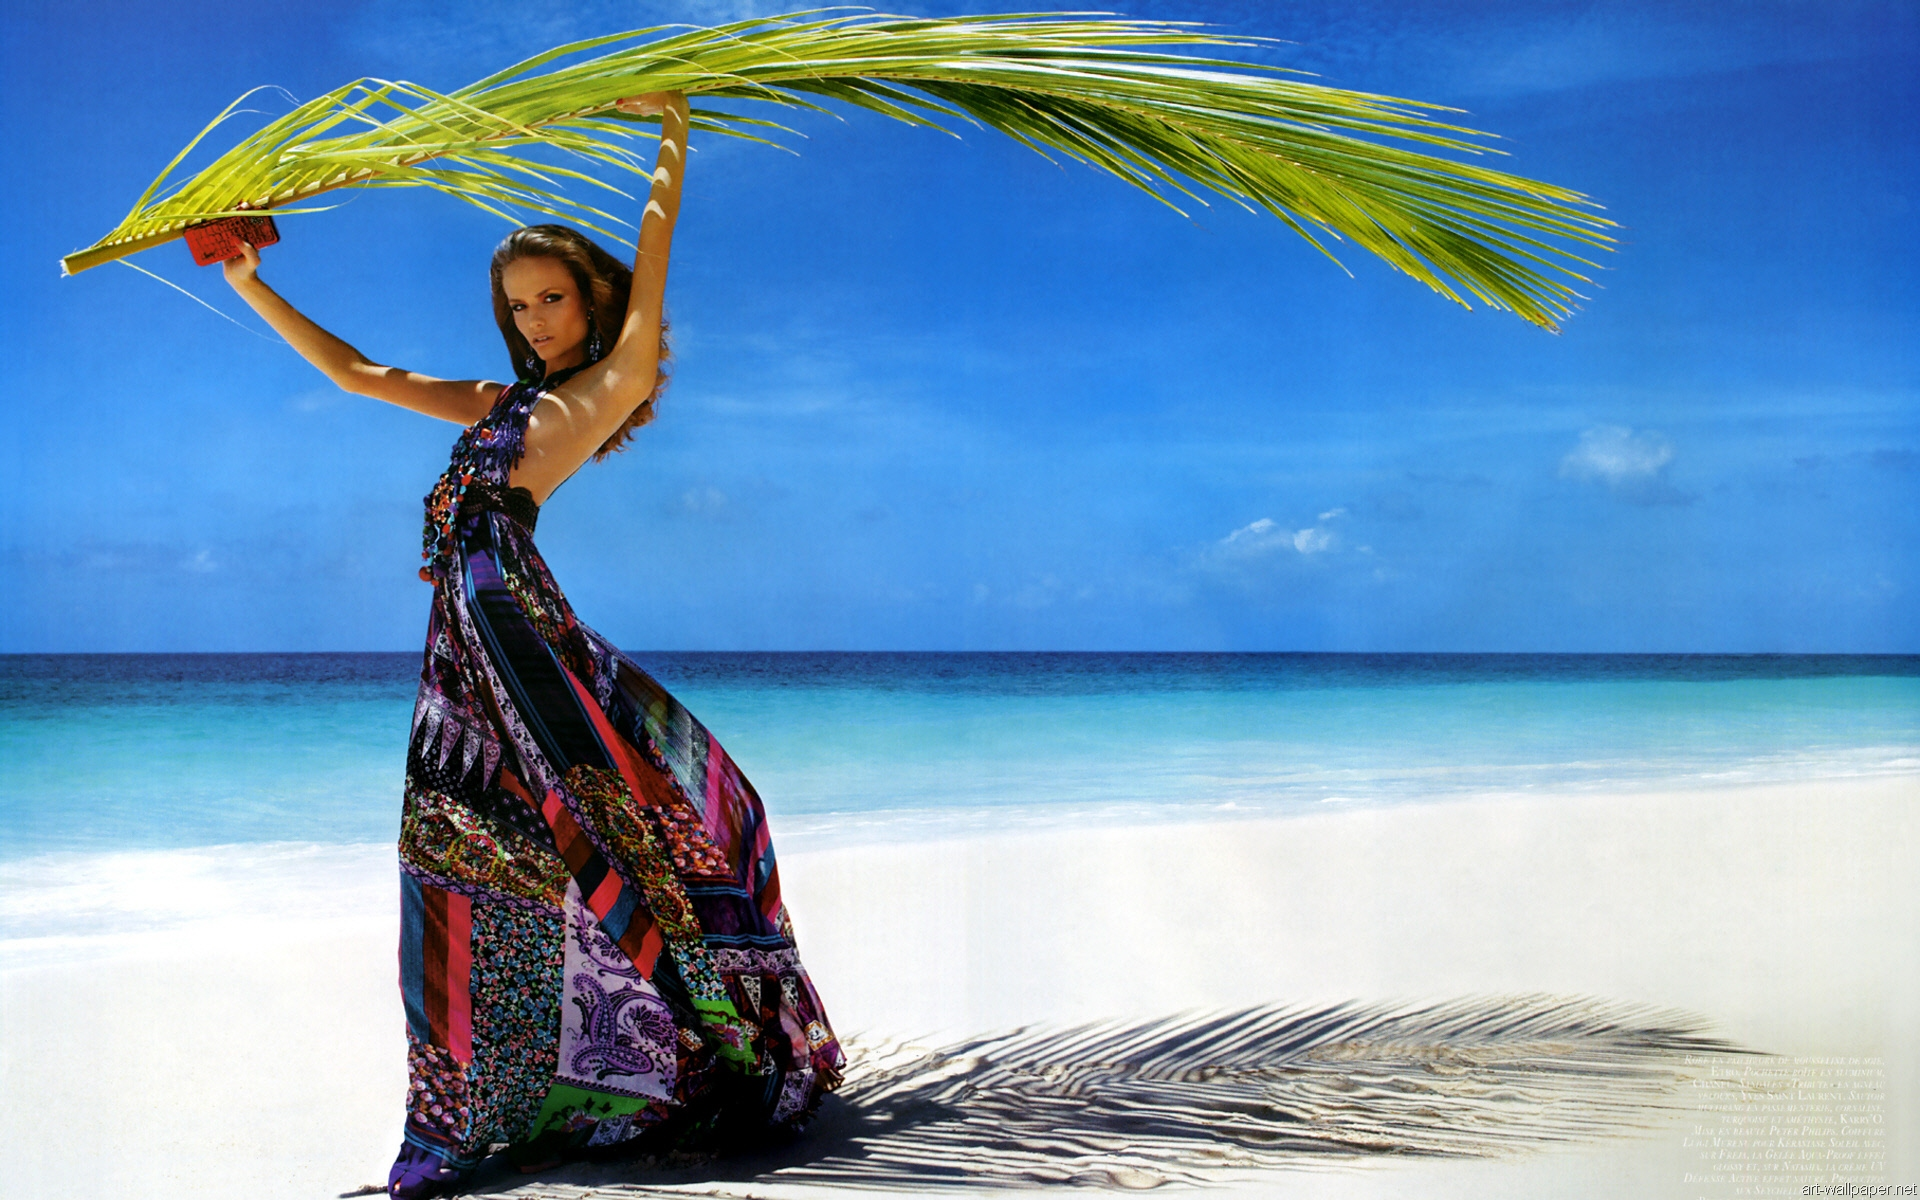 Hd widescreen girls wallpapers wallpapersafari - Beach girl wallpaper hd ...